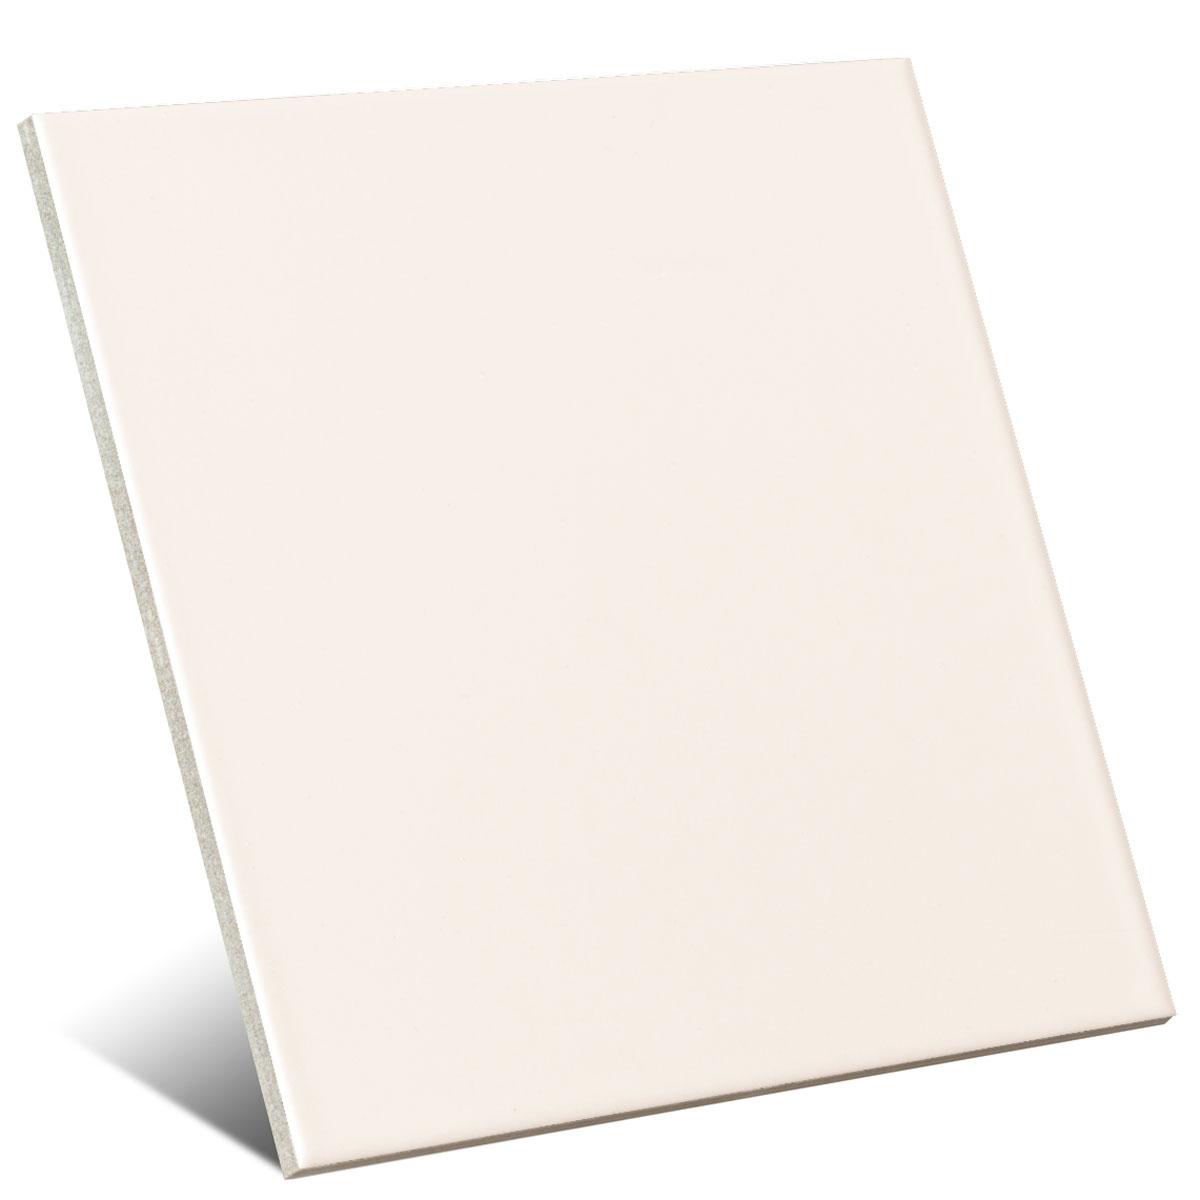 Color blanco mate 20x20 cm (caja 1 m2)